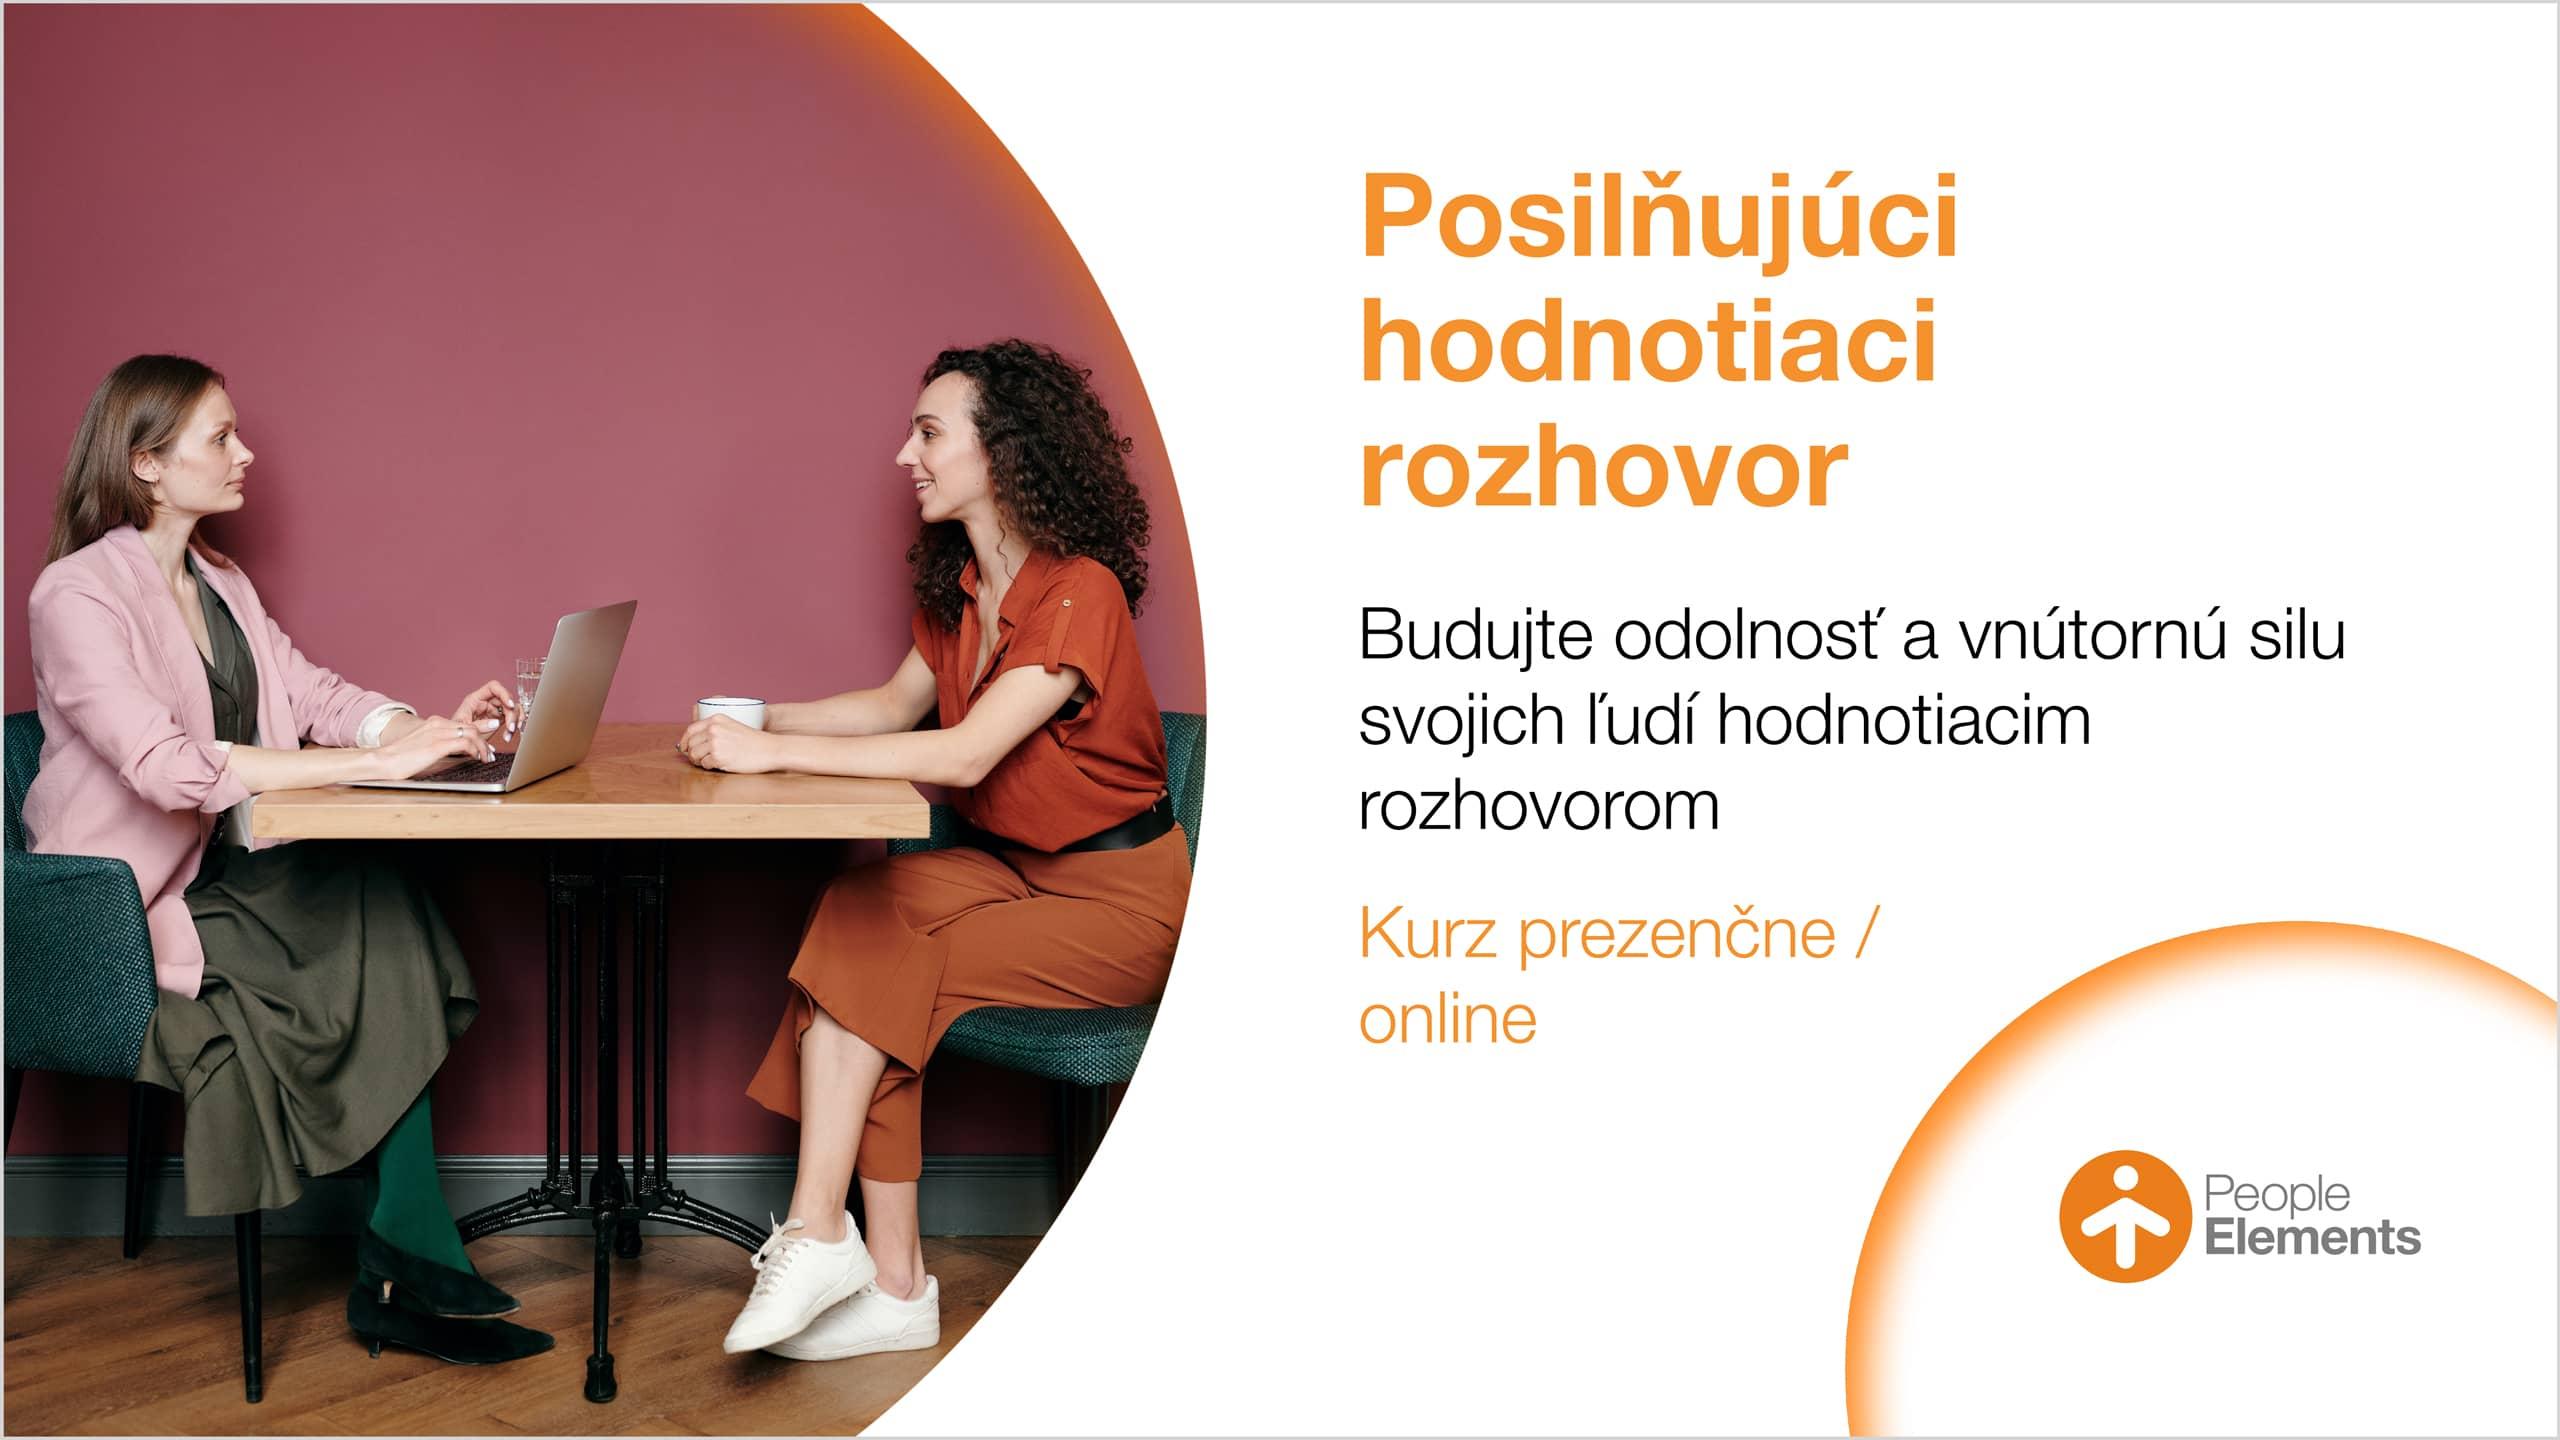 pe_banner-novinky-hodnot-rozhovor-1920x1080@2x-c